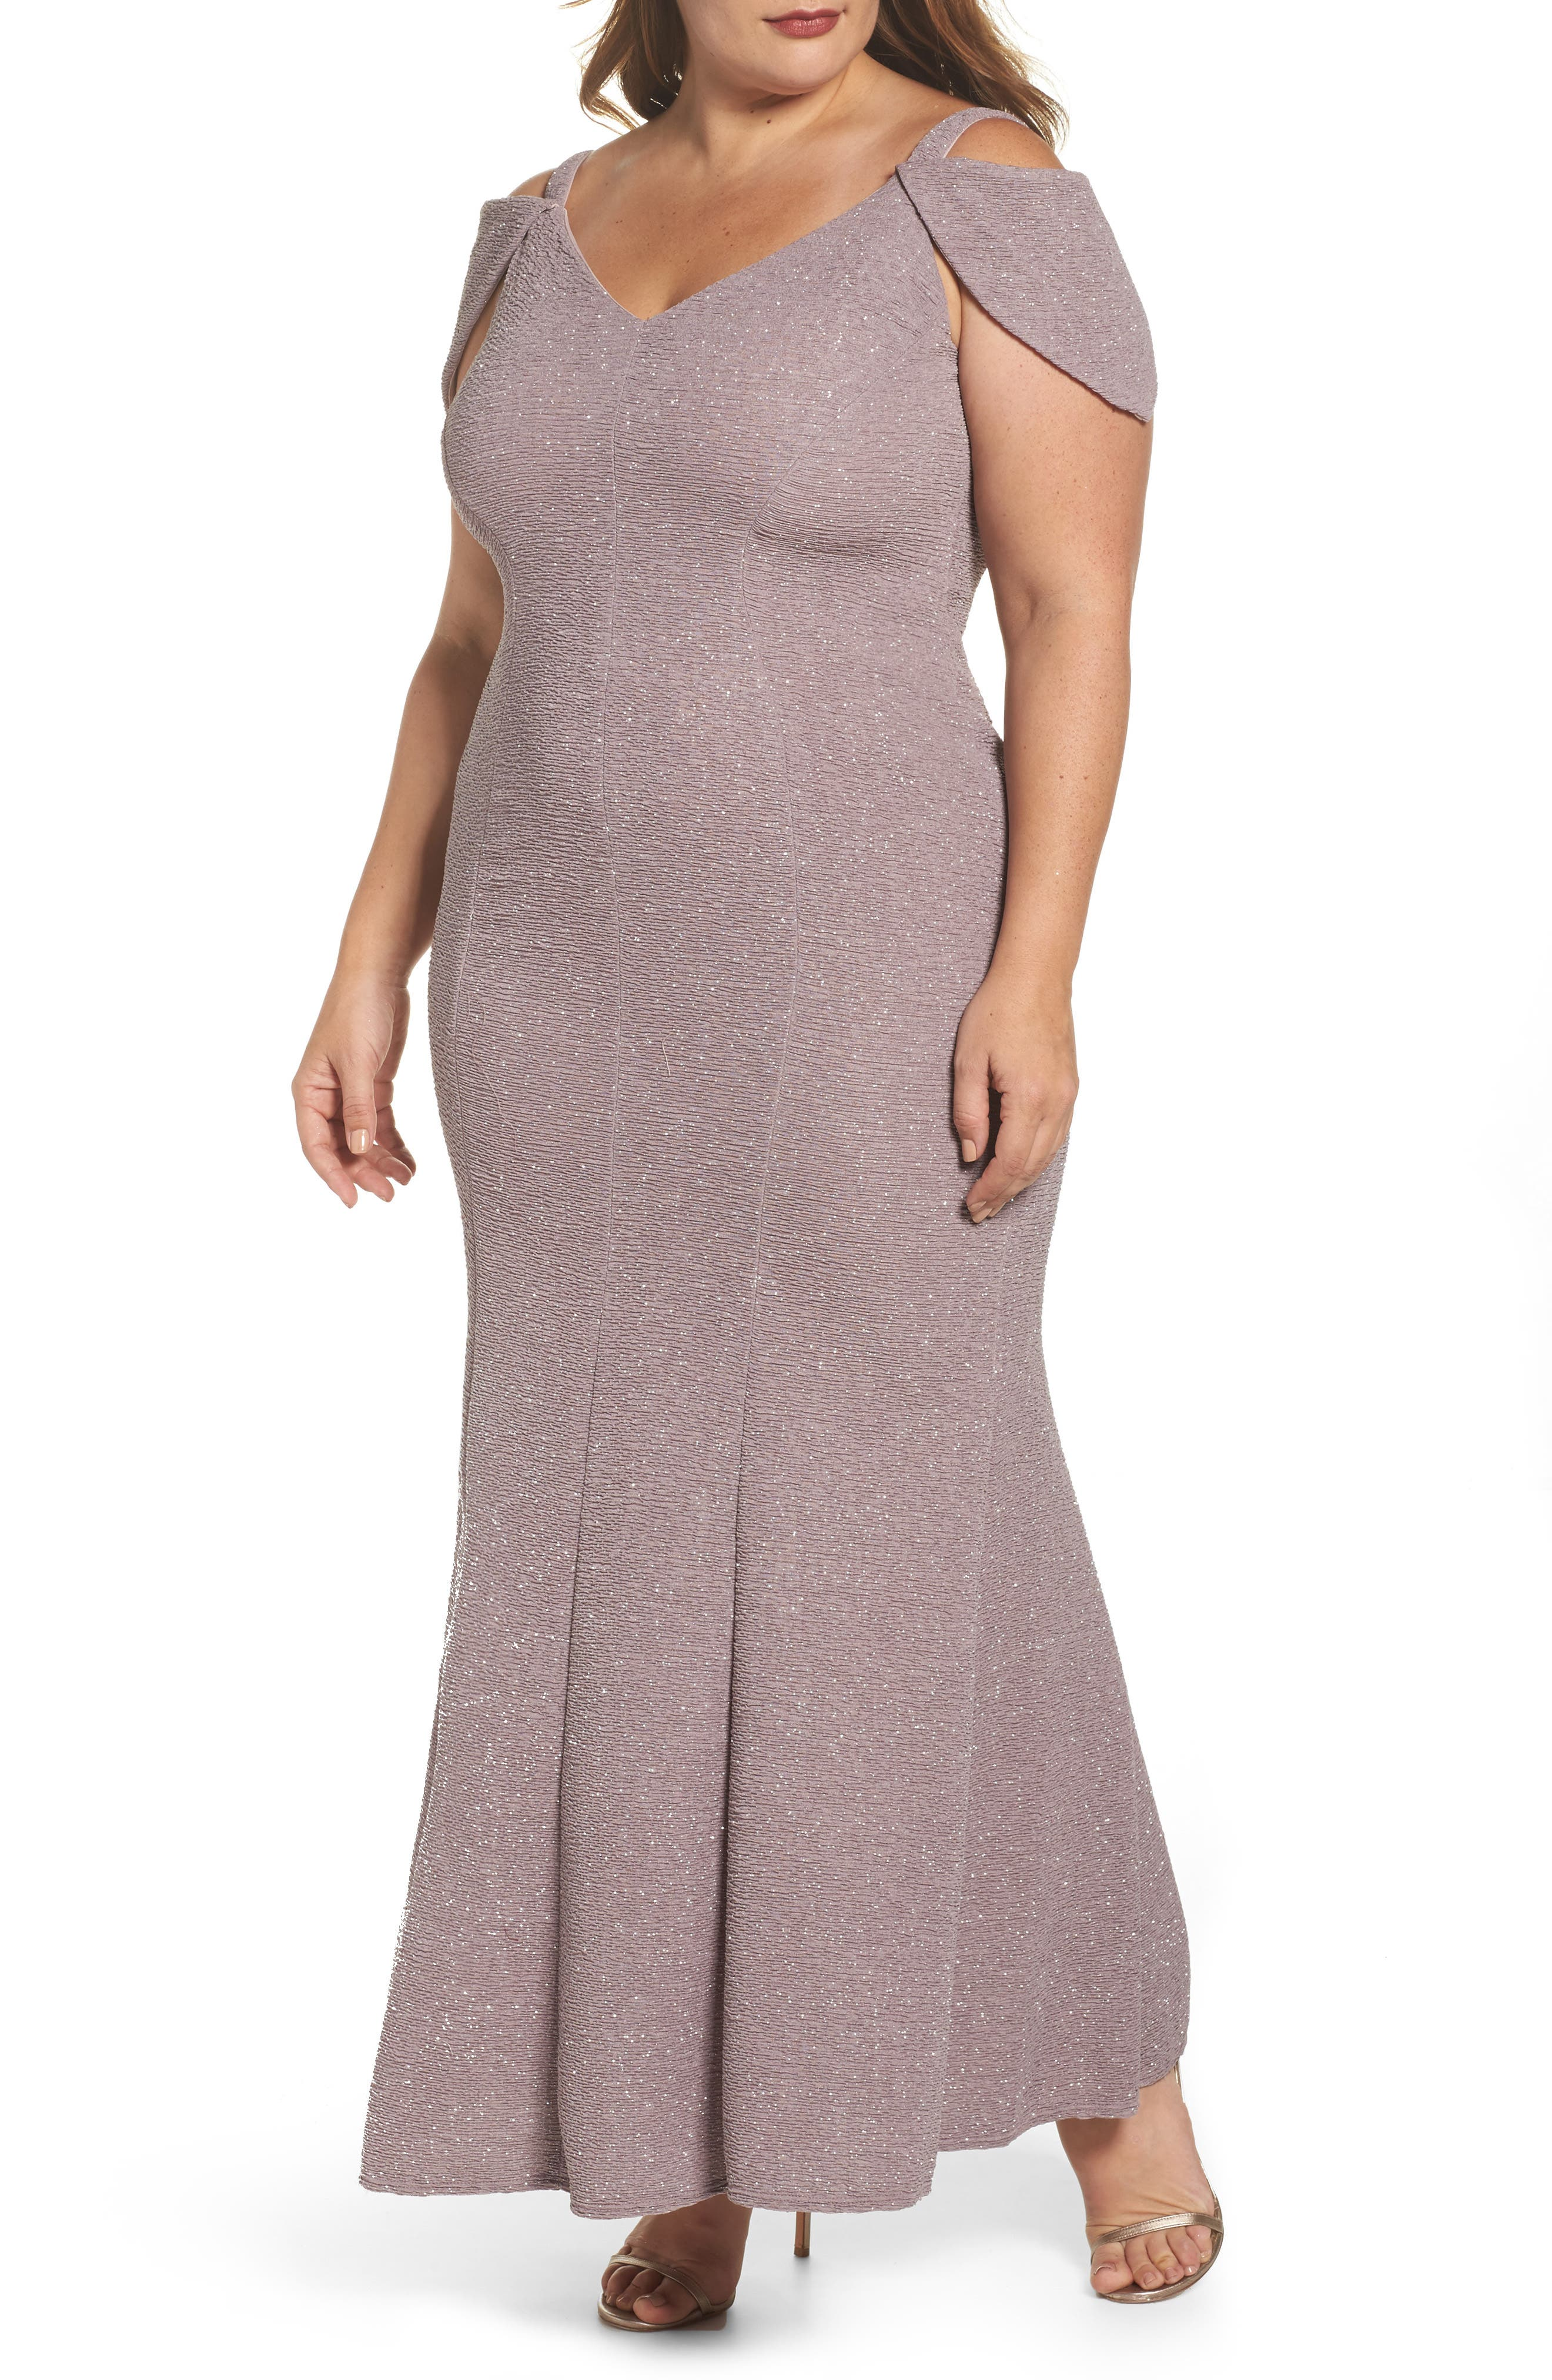 Main Image - Morgan & Co. Cold Shoulder Glitter Knit Gown (Plus Size)